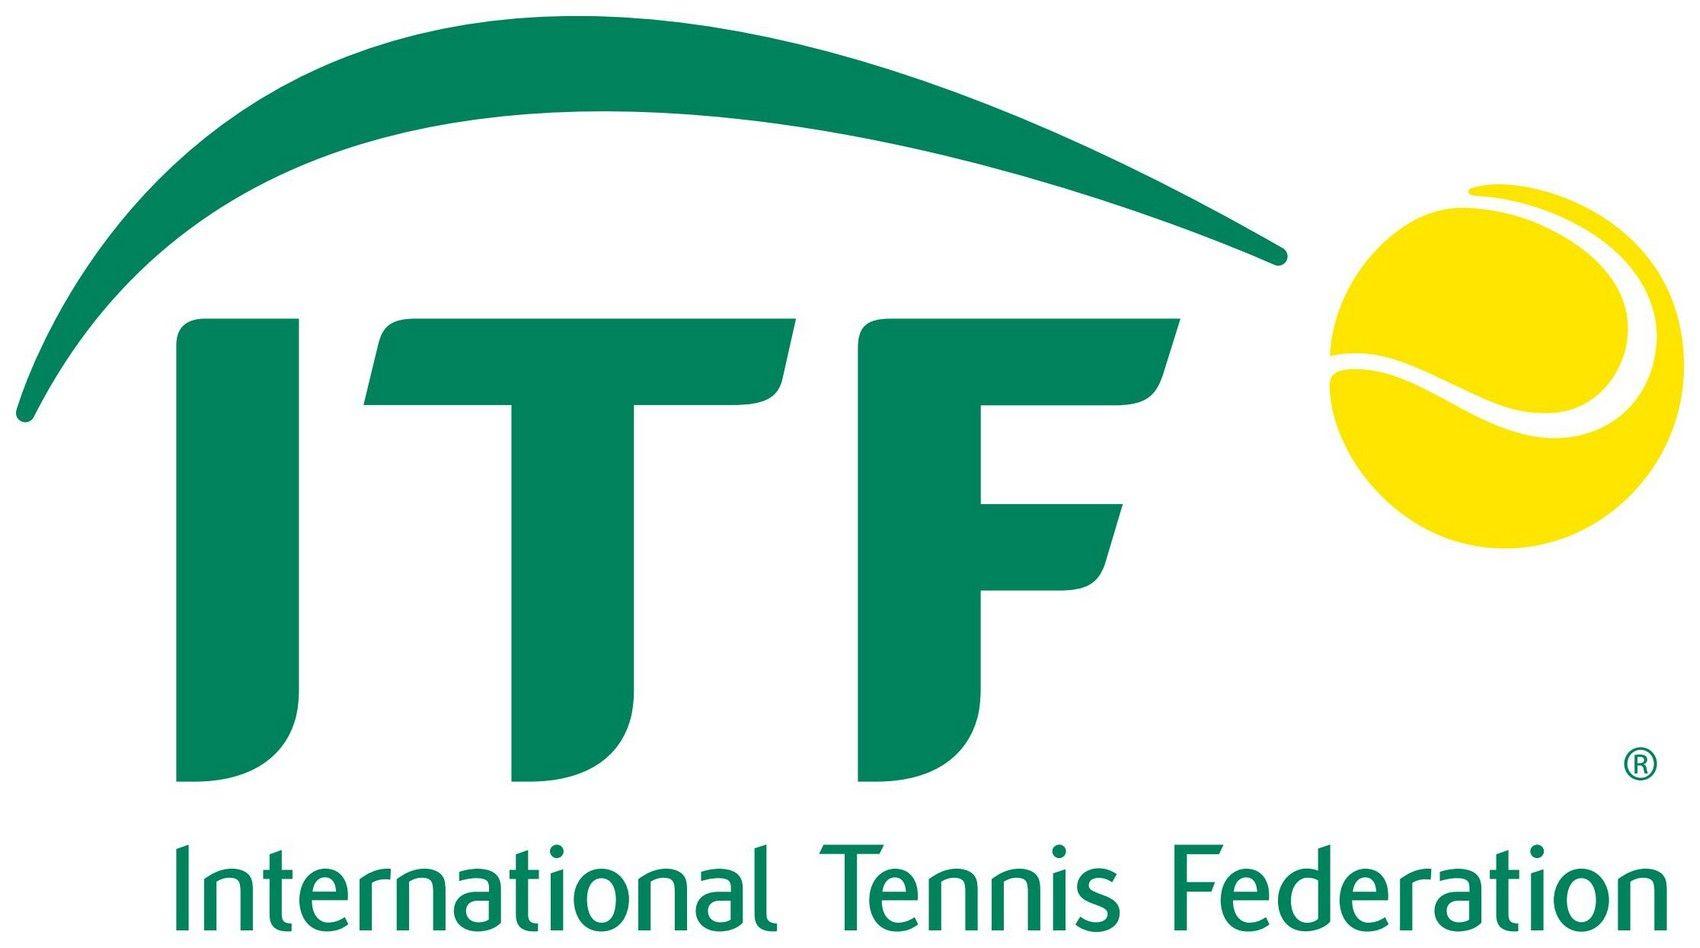 International Tennis Federation Itf Logo Eps File Asoif Association Of Summer Olympic I International Tennis Federation Tennis Events Tennis Tournaments